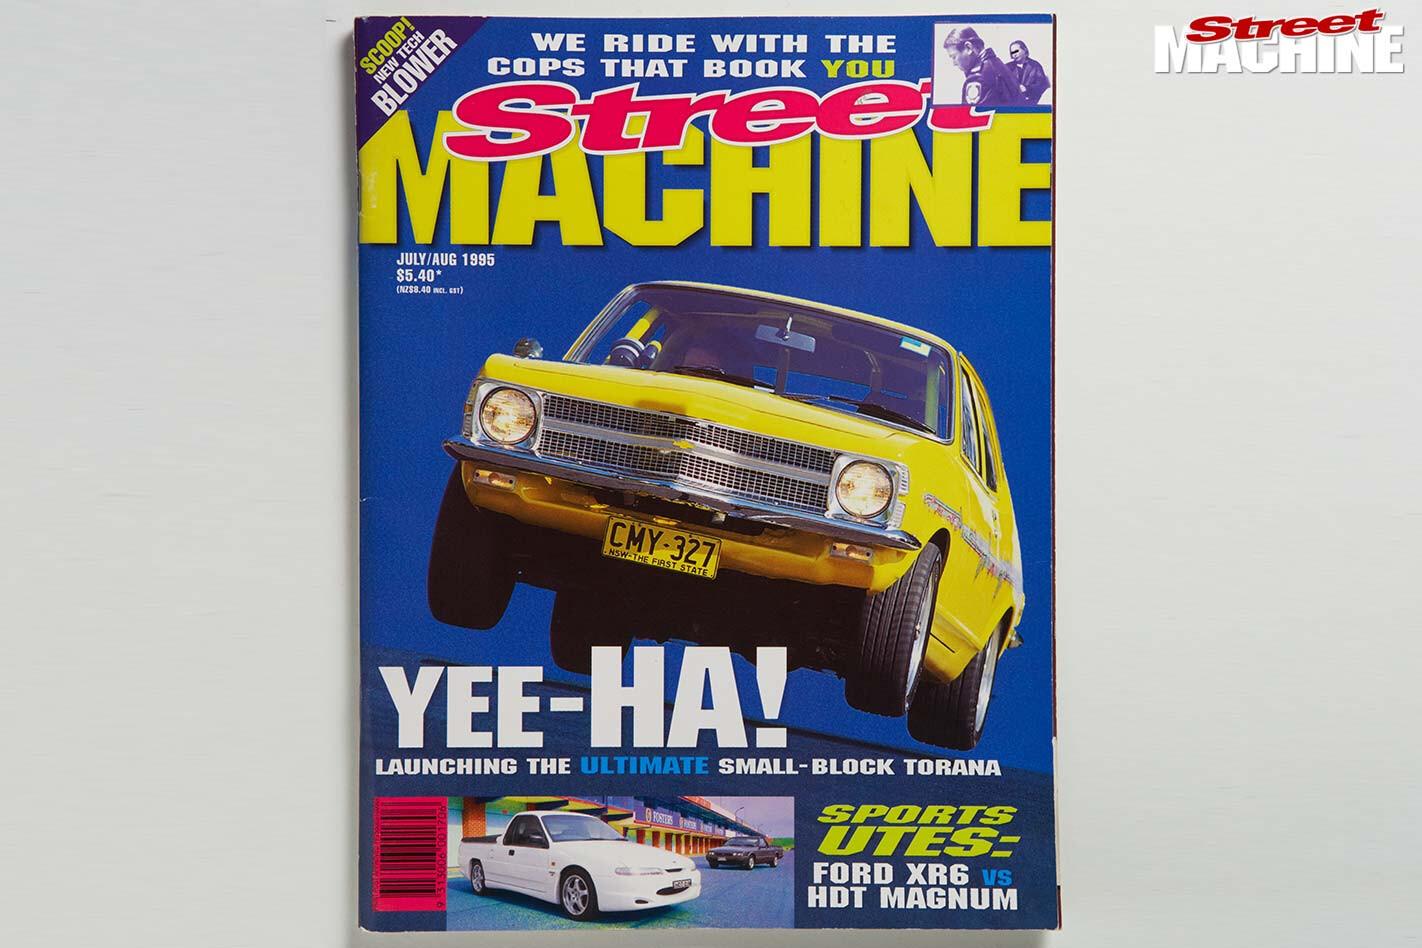 Street Machine cover